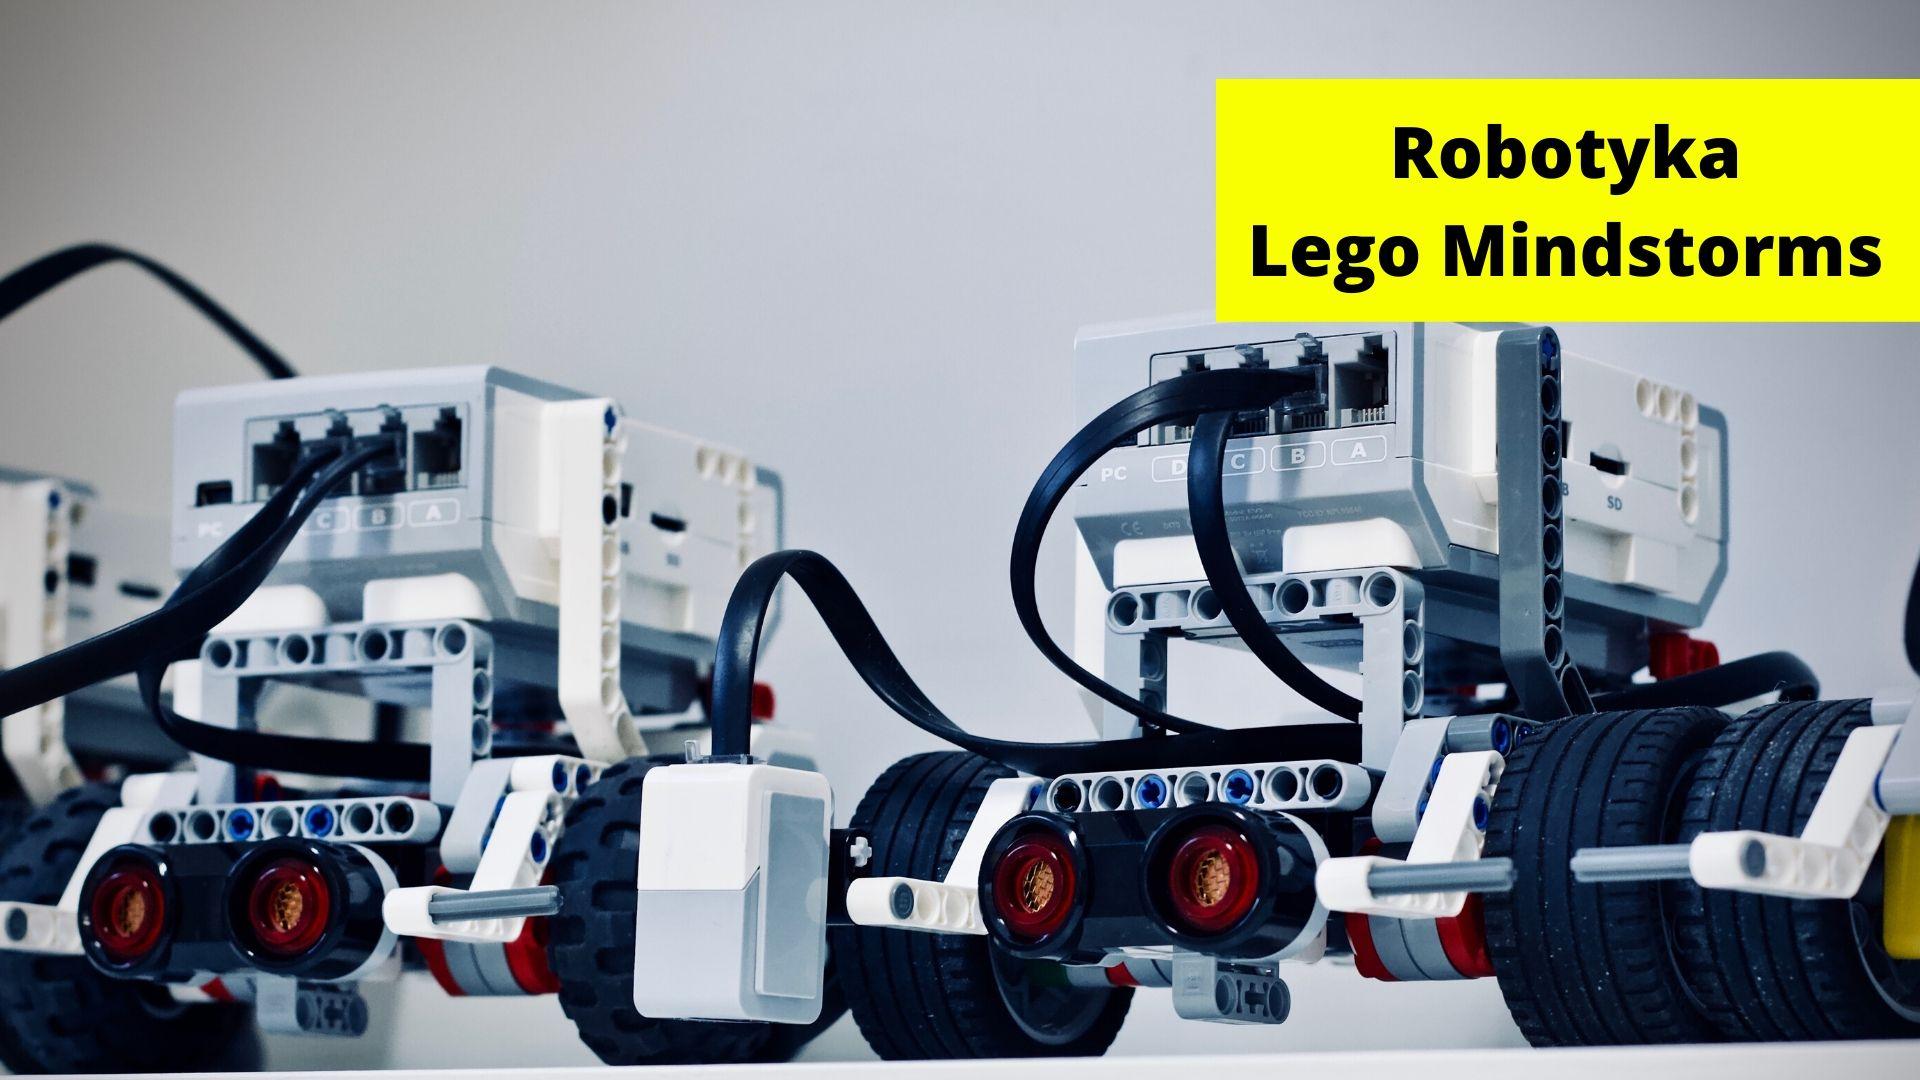 Robotyka - Lego Mindstorms